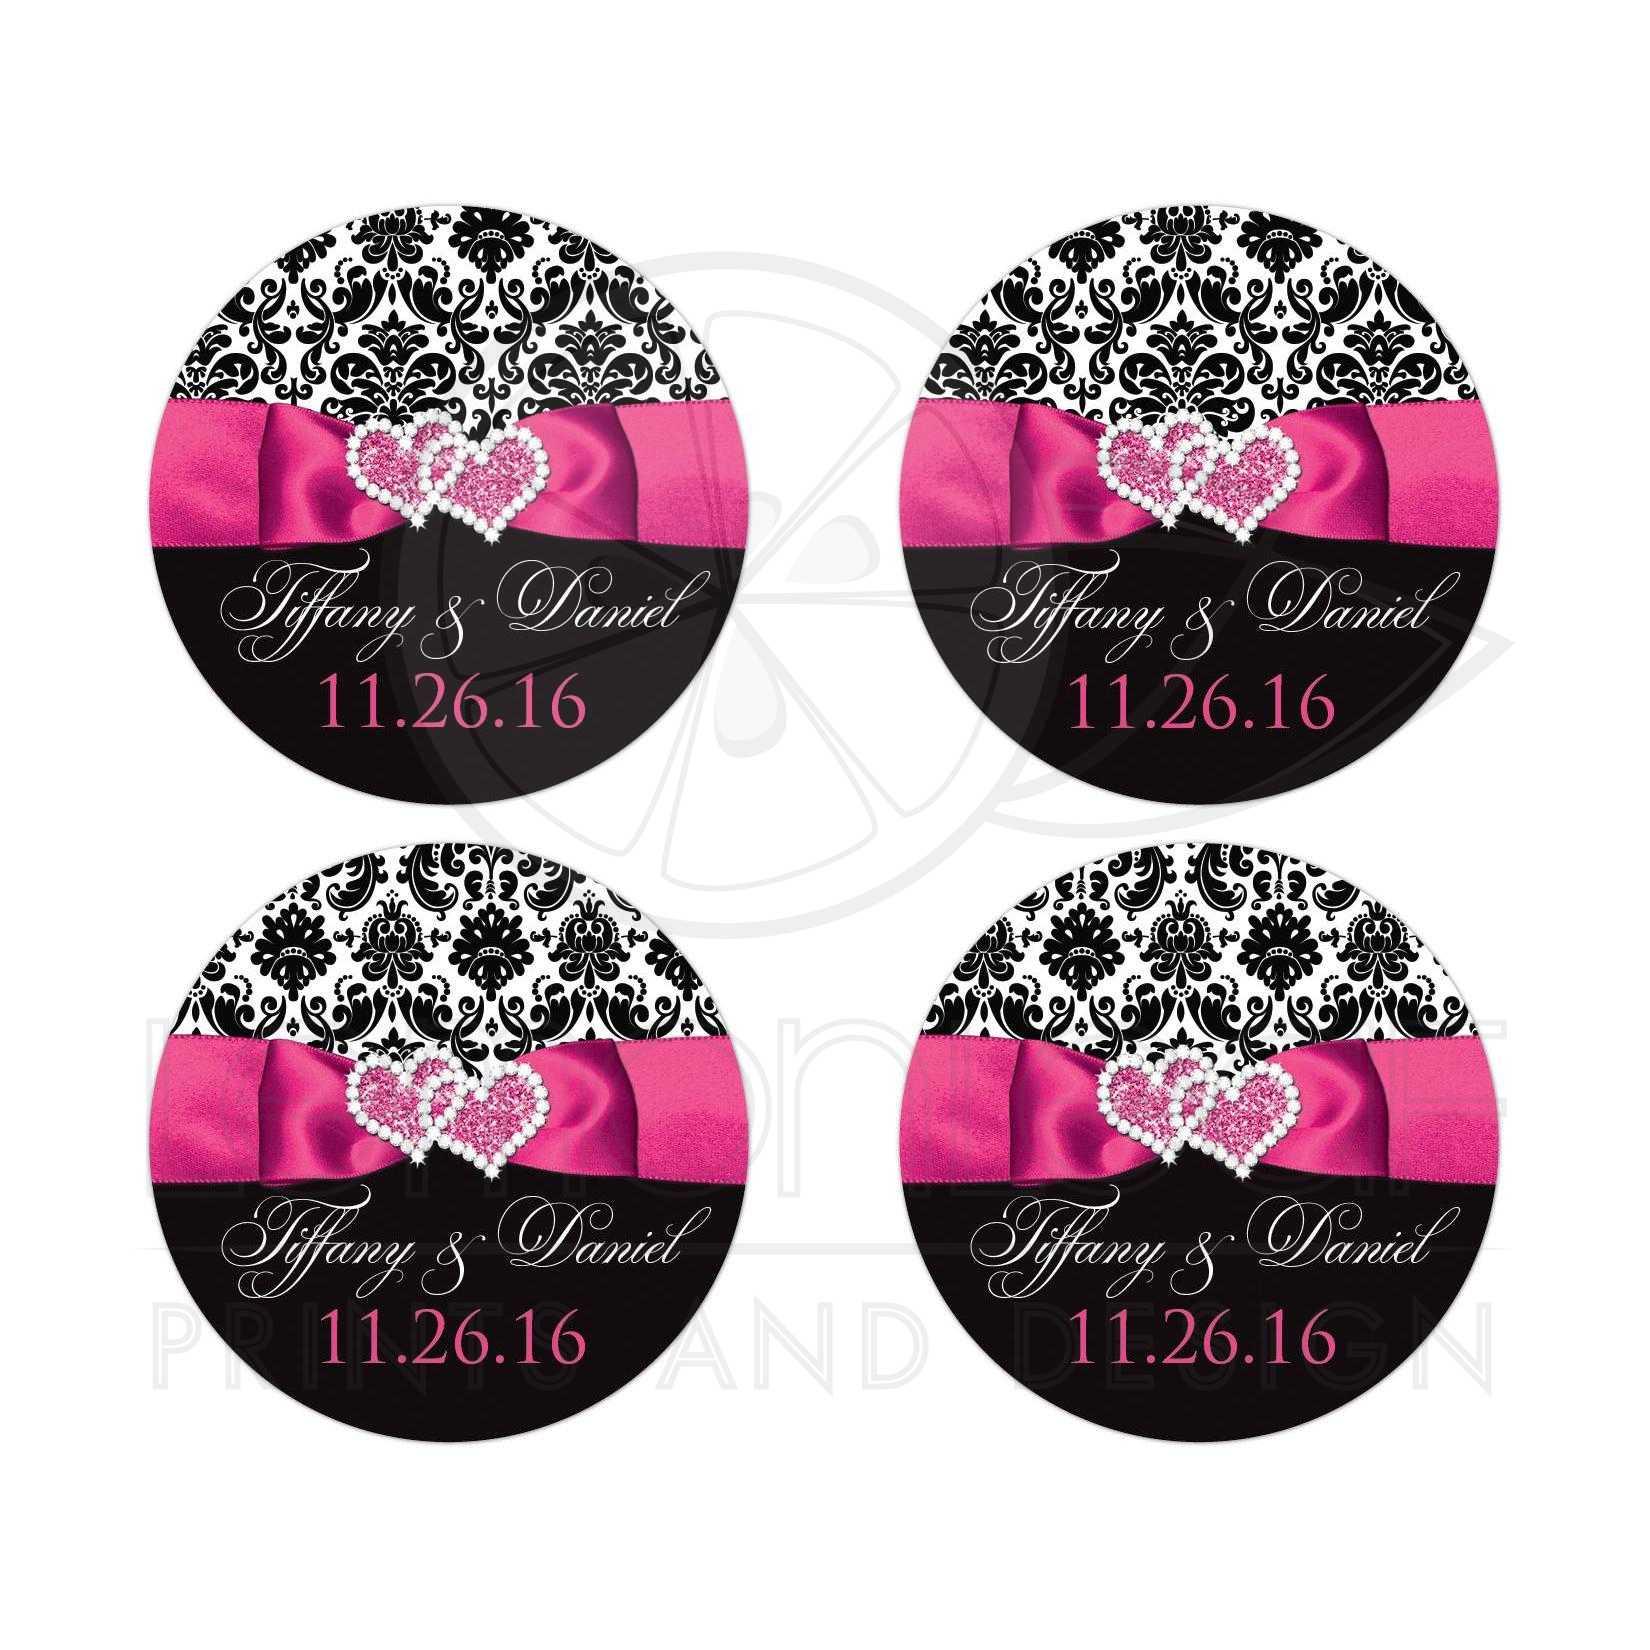 Wedding Favor Sticker Black And White Damask Printed Pink Ribbon